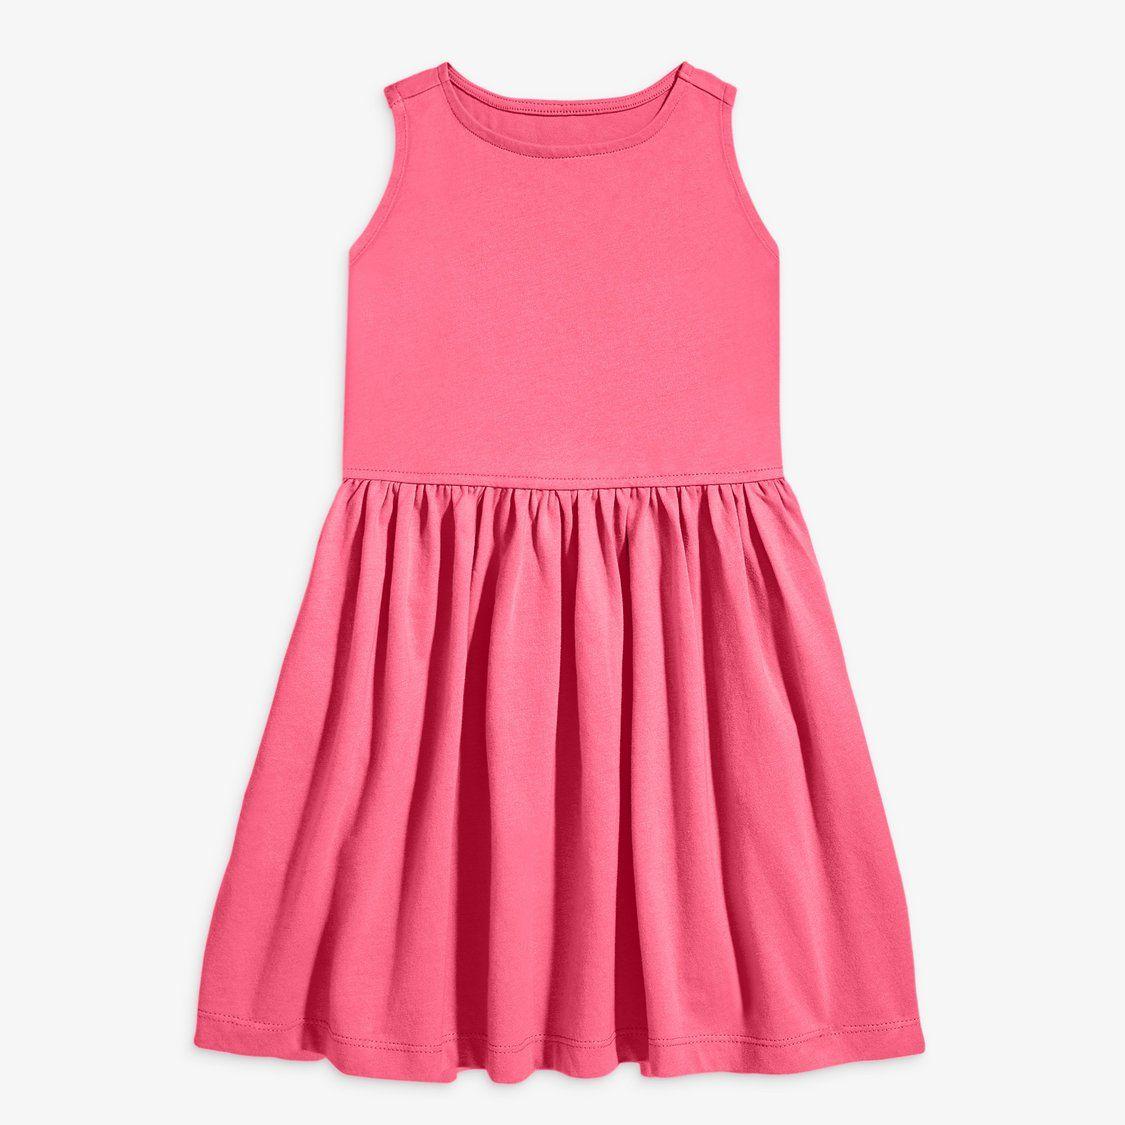 Kids Sleeveless Tank Dress With Pockets Primary Com Sleeveless Dress Summer Girls Dresses Summer Sleeveless Cotton Dress [ 1125 x 1125 Pixel ]